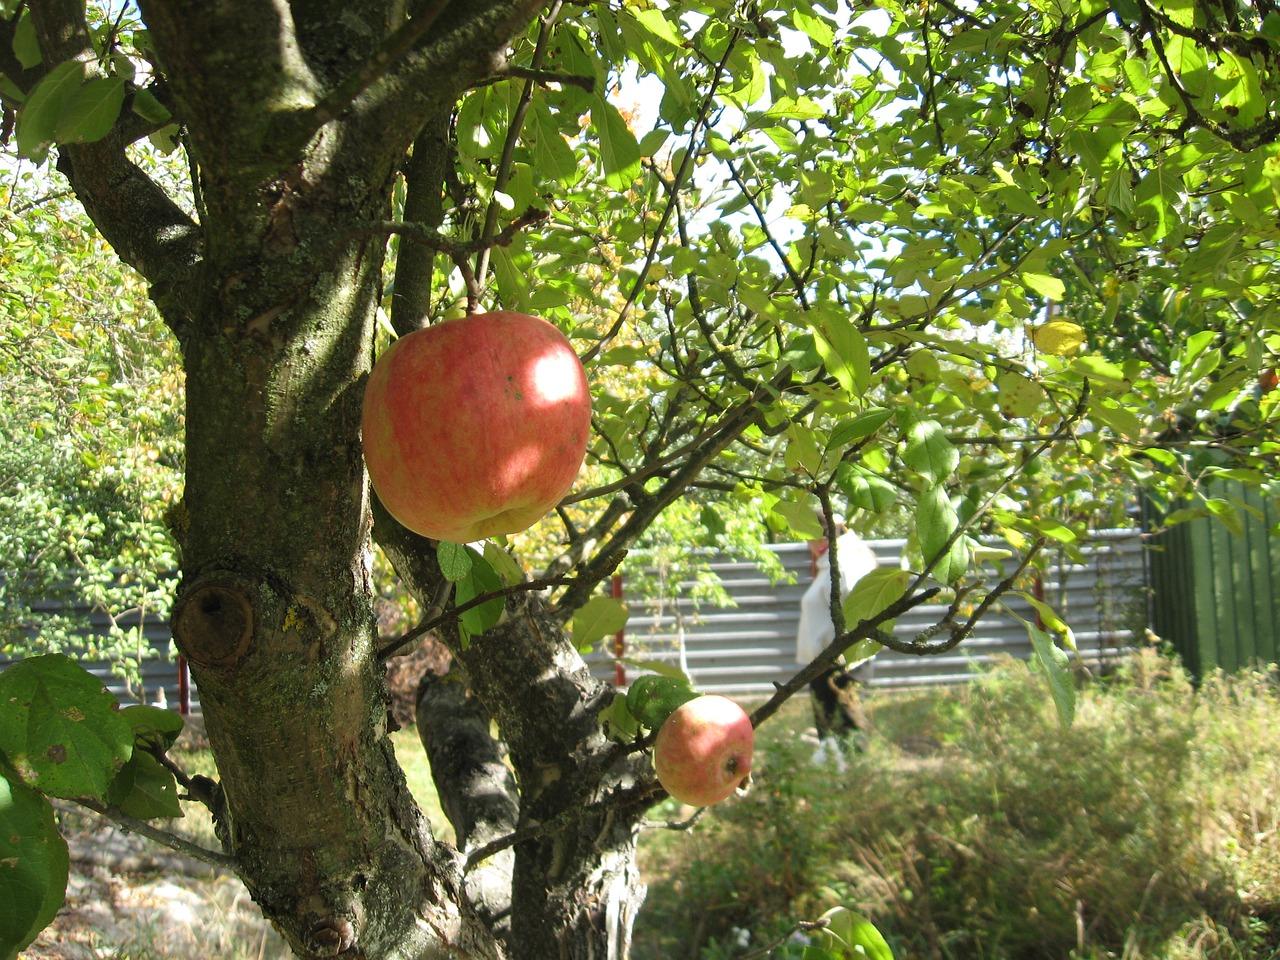 Яблоня на дачном участке